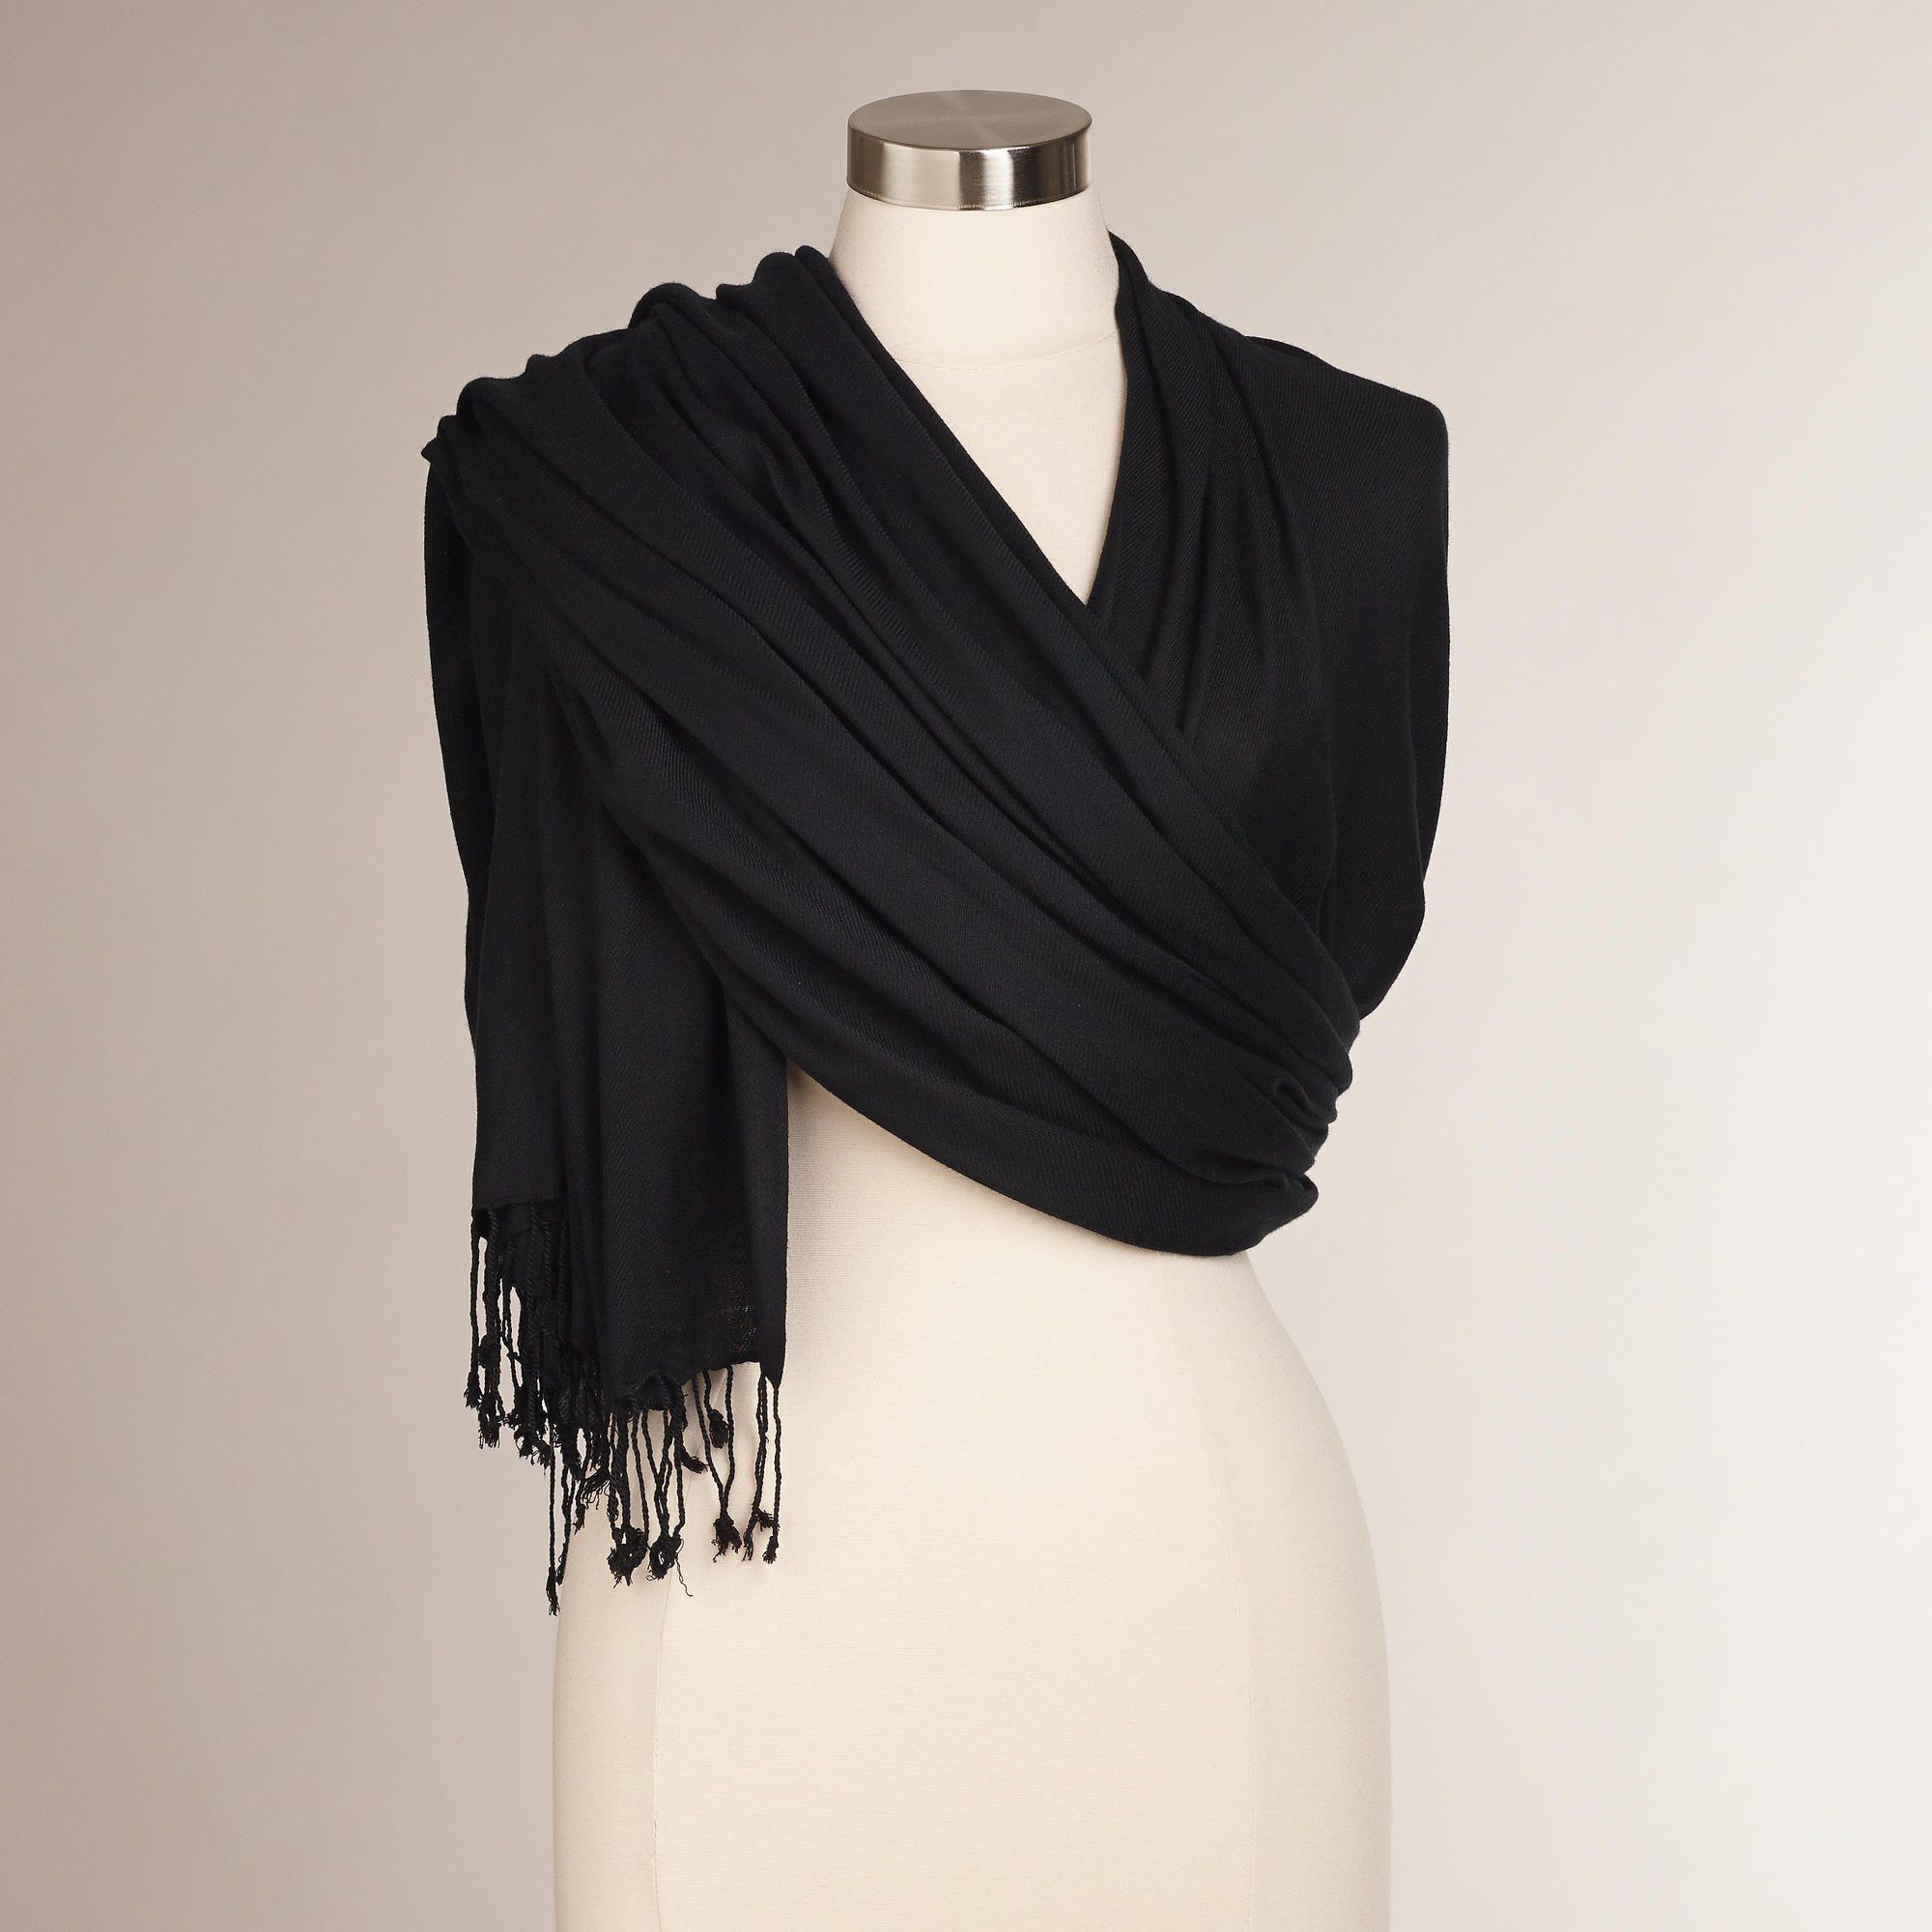 Black pashmina style shawl pashmina shawl dress with